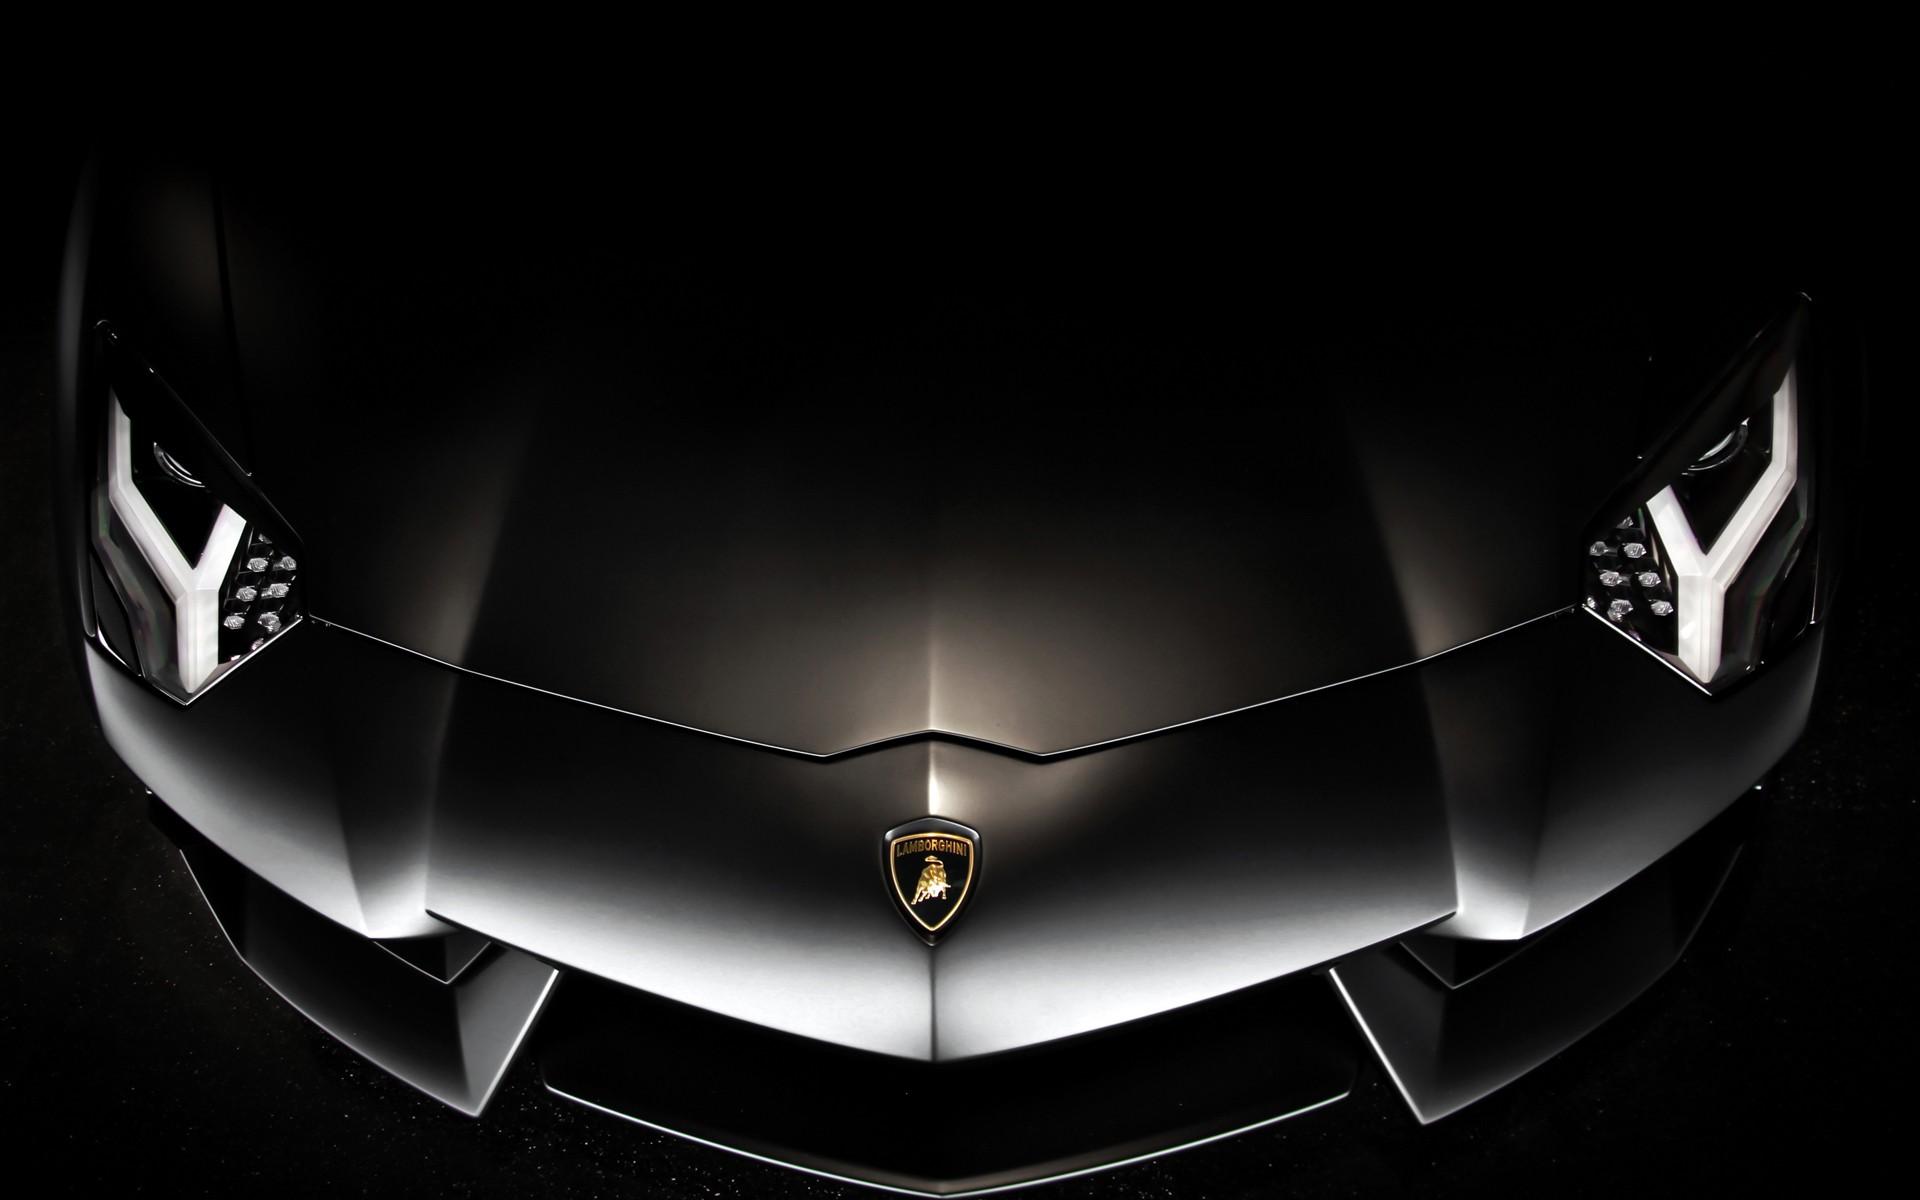 wallpaperstocknetblack lamborghini aventador bonnet_wallpapers_33586 - Tron Lamborghini Aventador Wallpaper